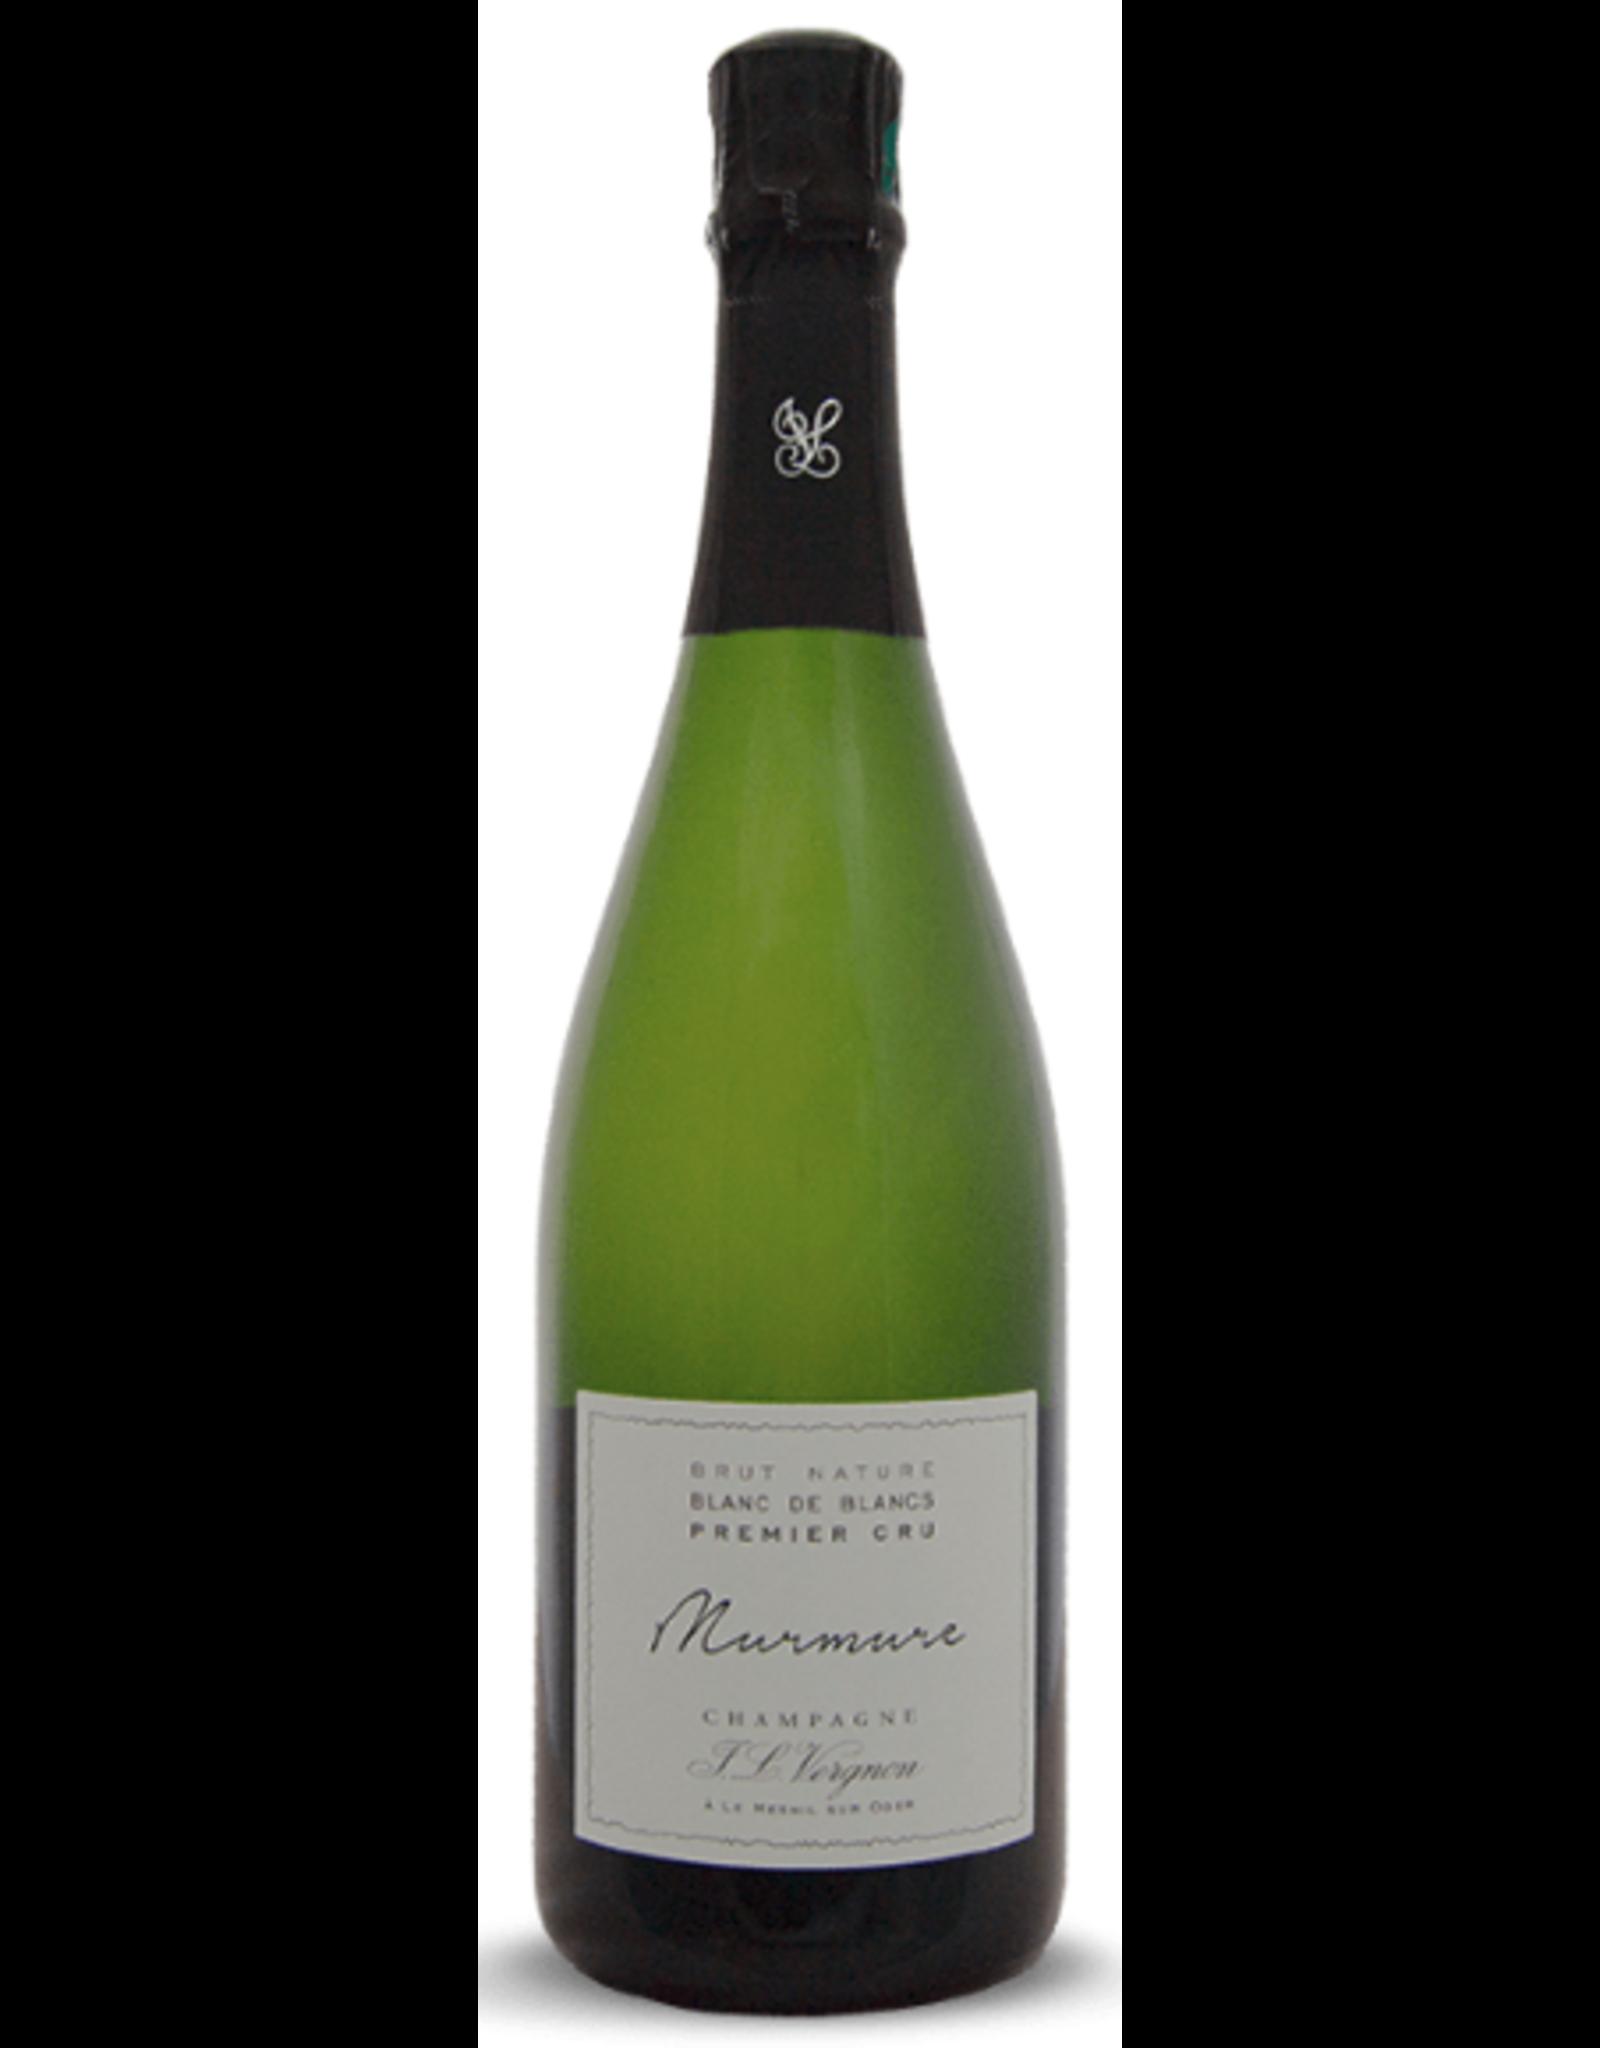 J.L. Vergnon Champagne J.L. Vergnon Murmure Brut Nature